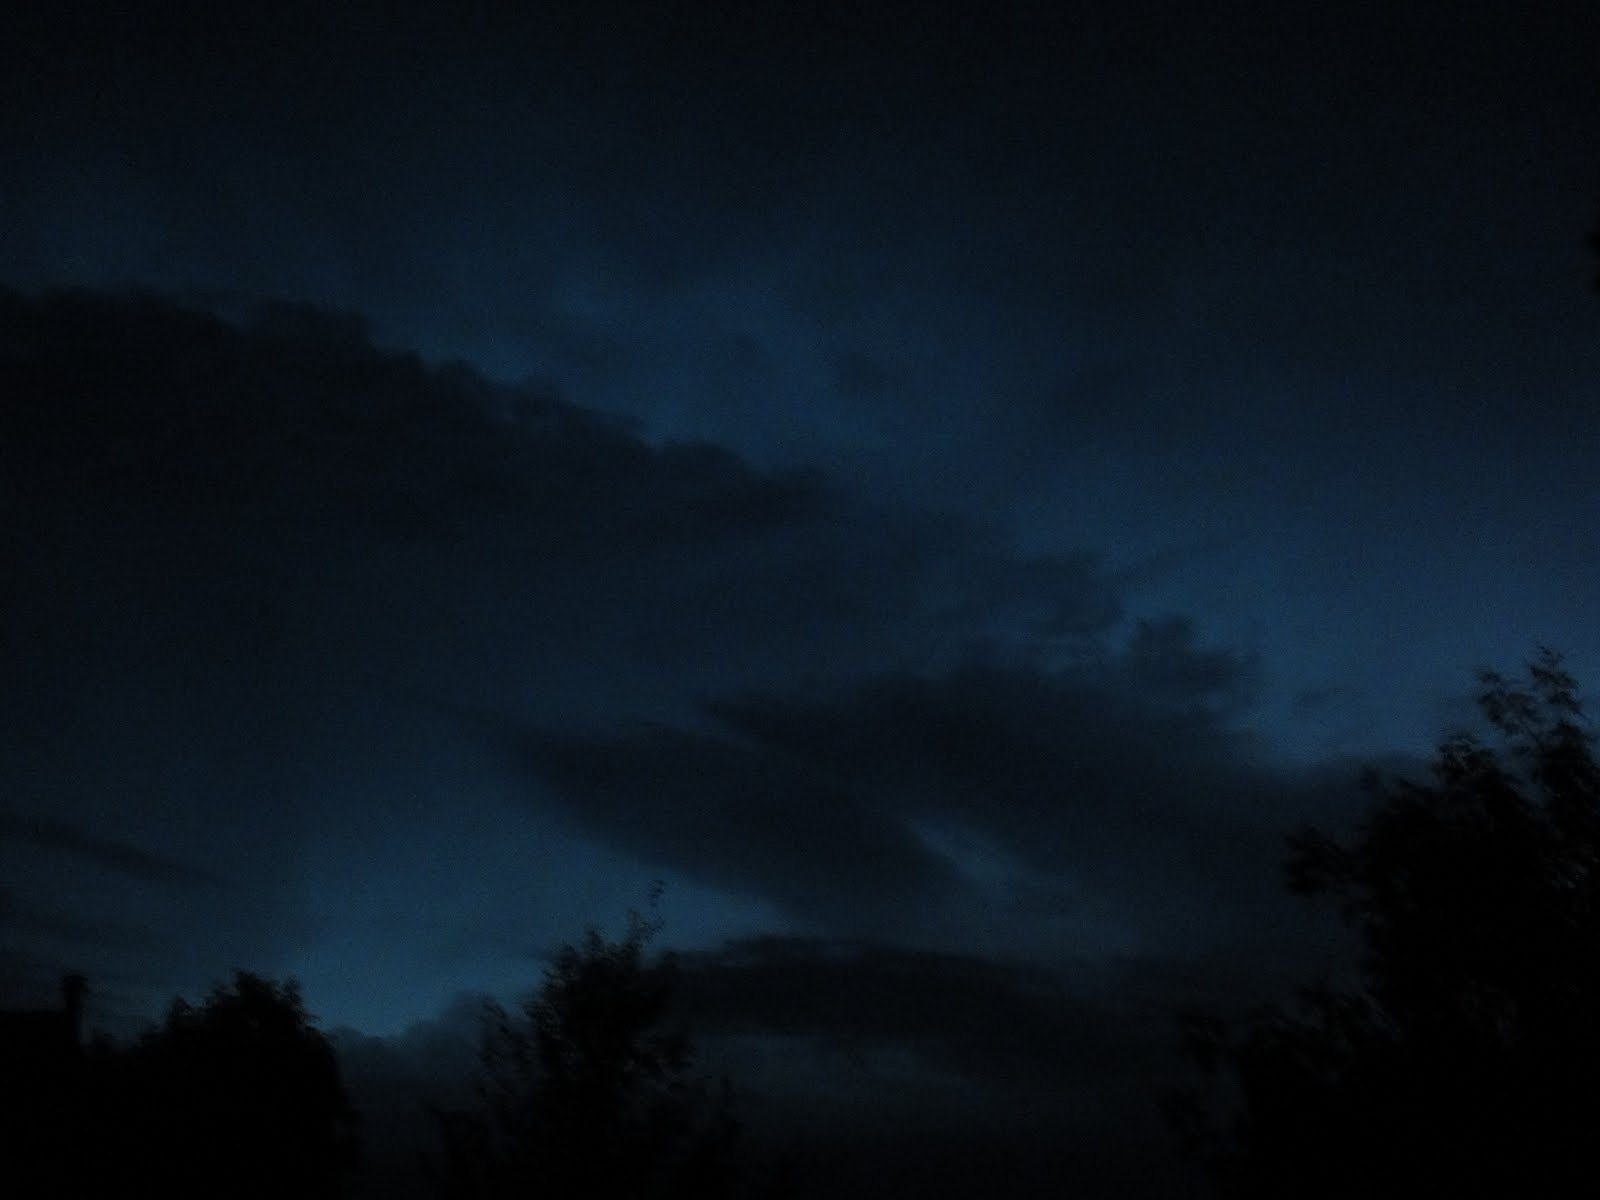 dark blue sky with - photo #3